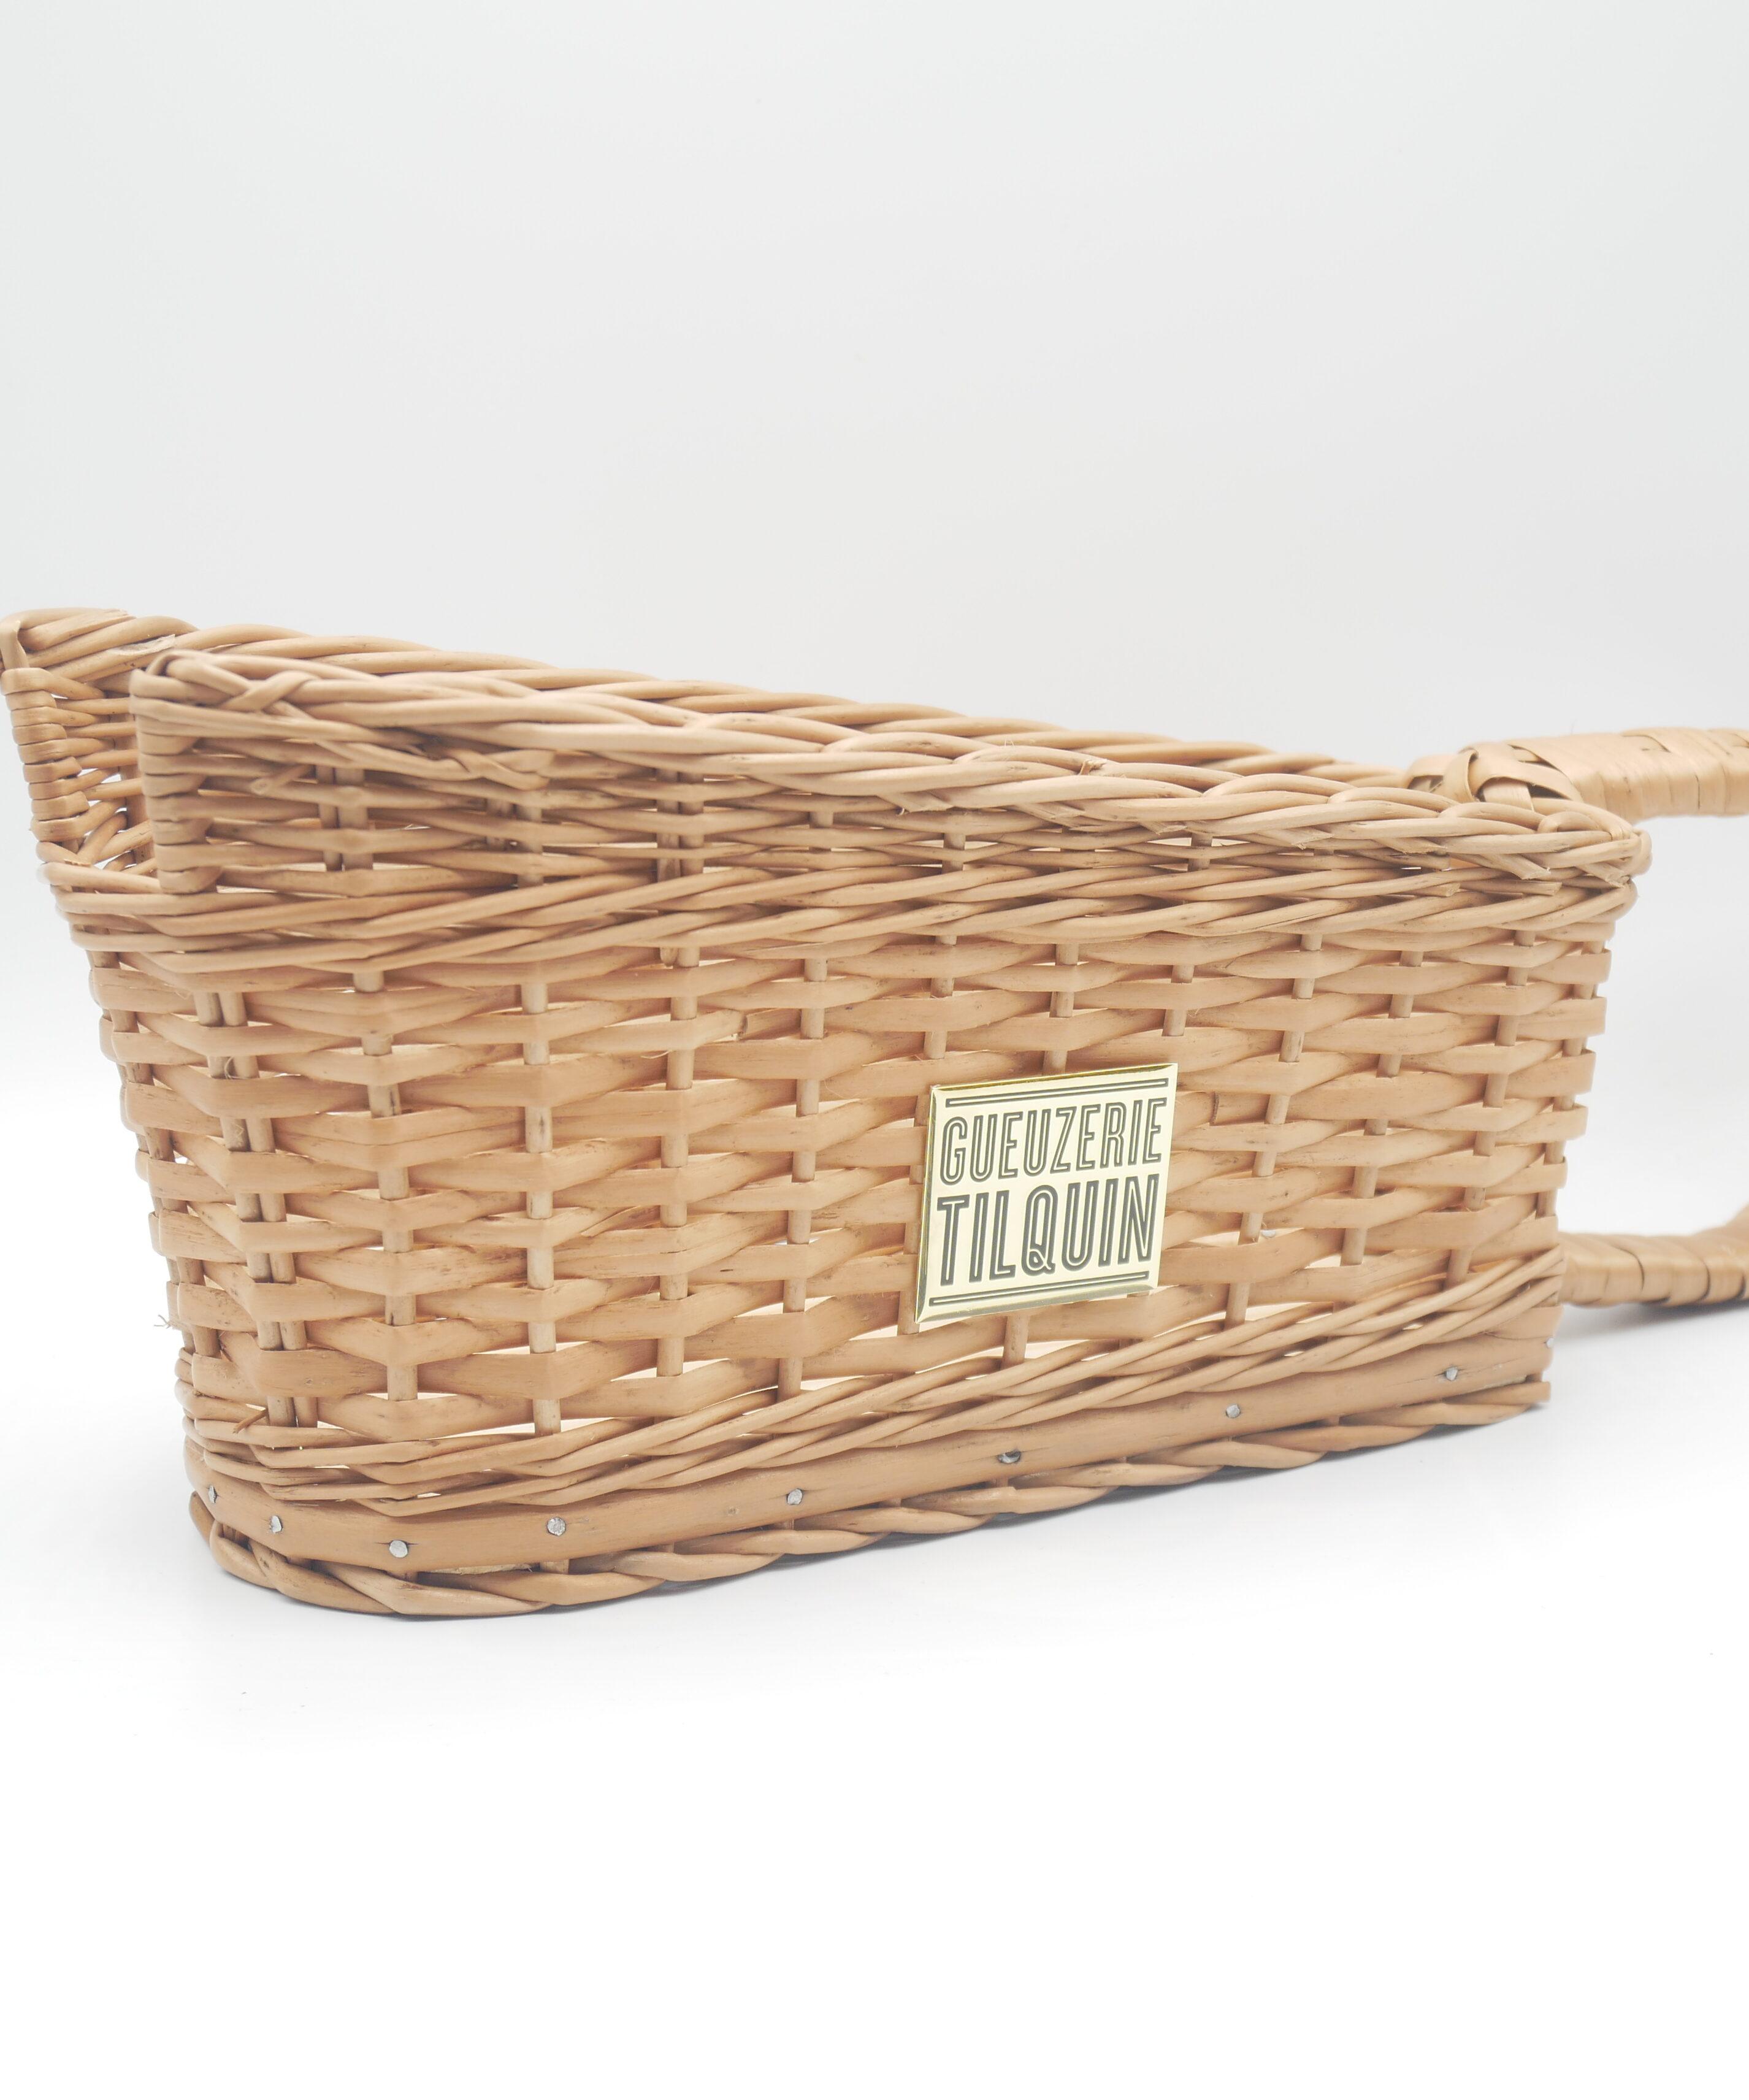 Img Tilquin Lambic Basket